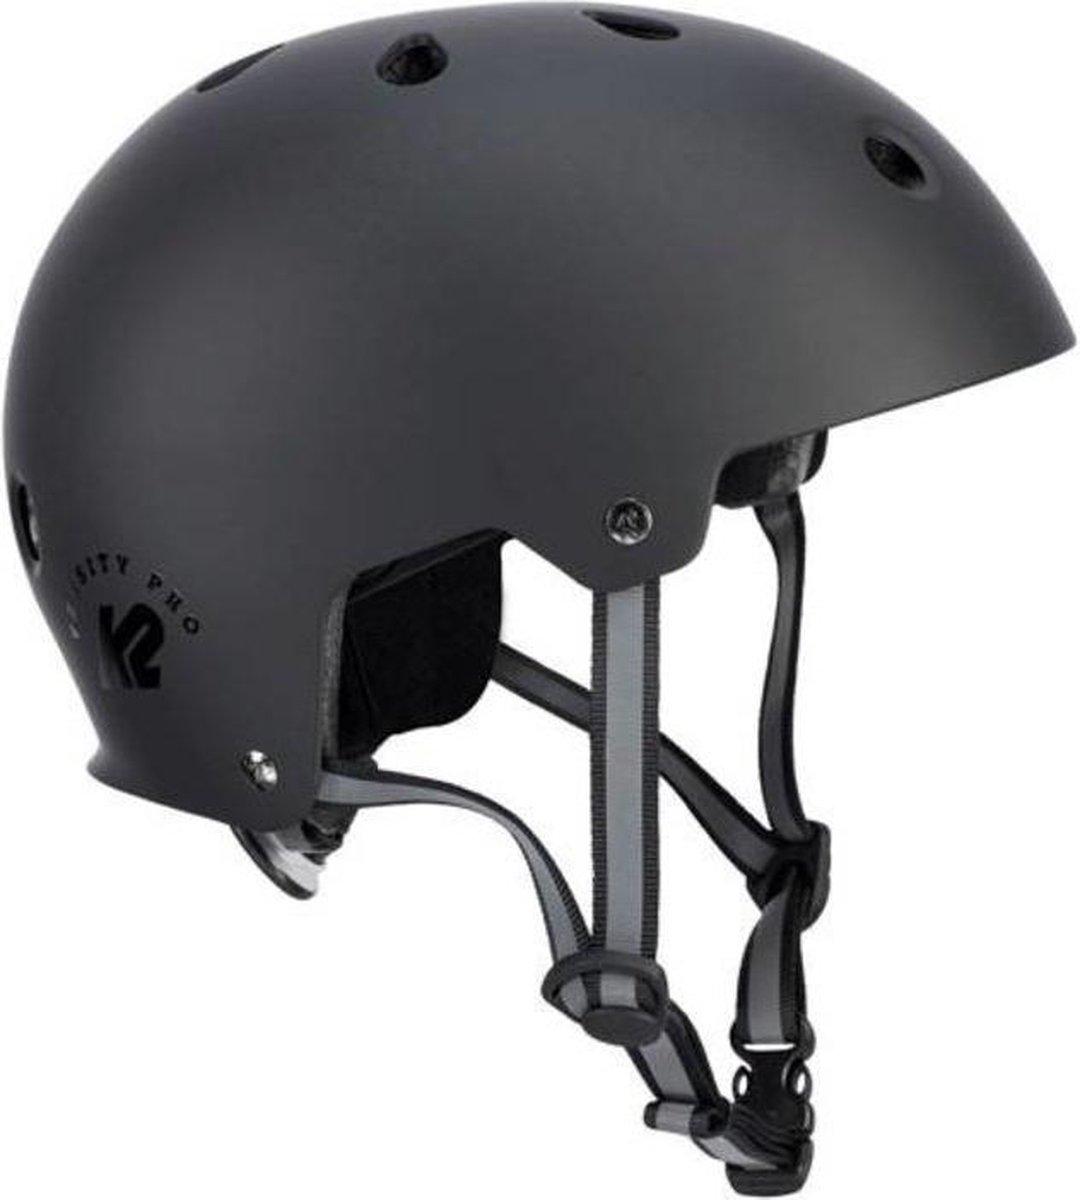 K2 helm varisity pro M